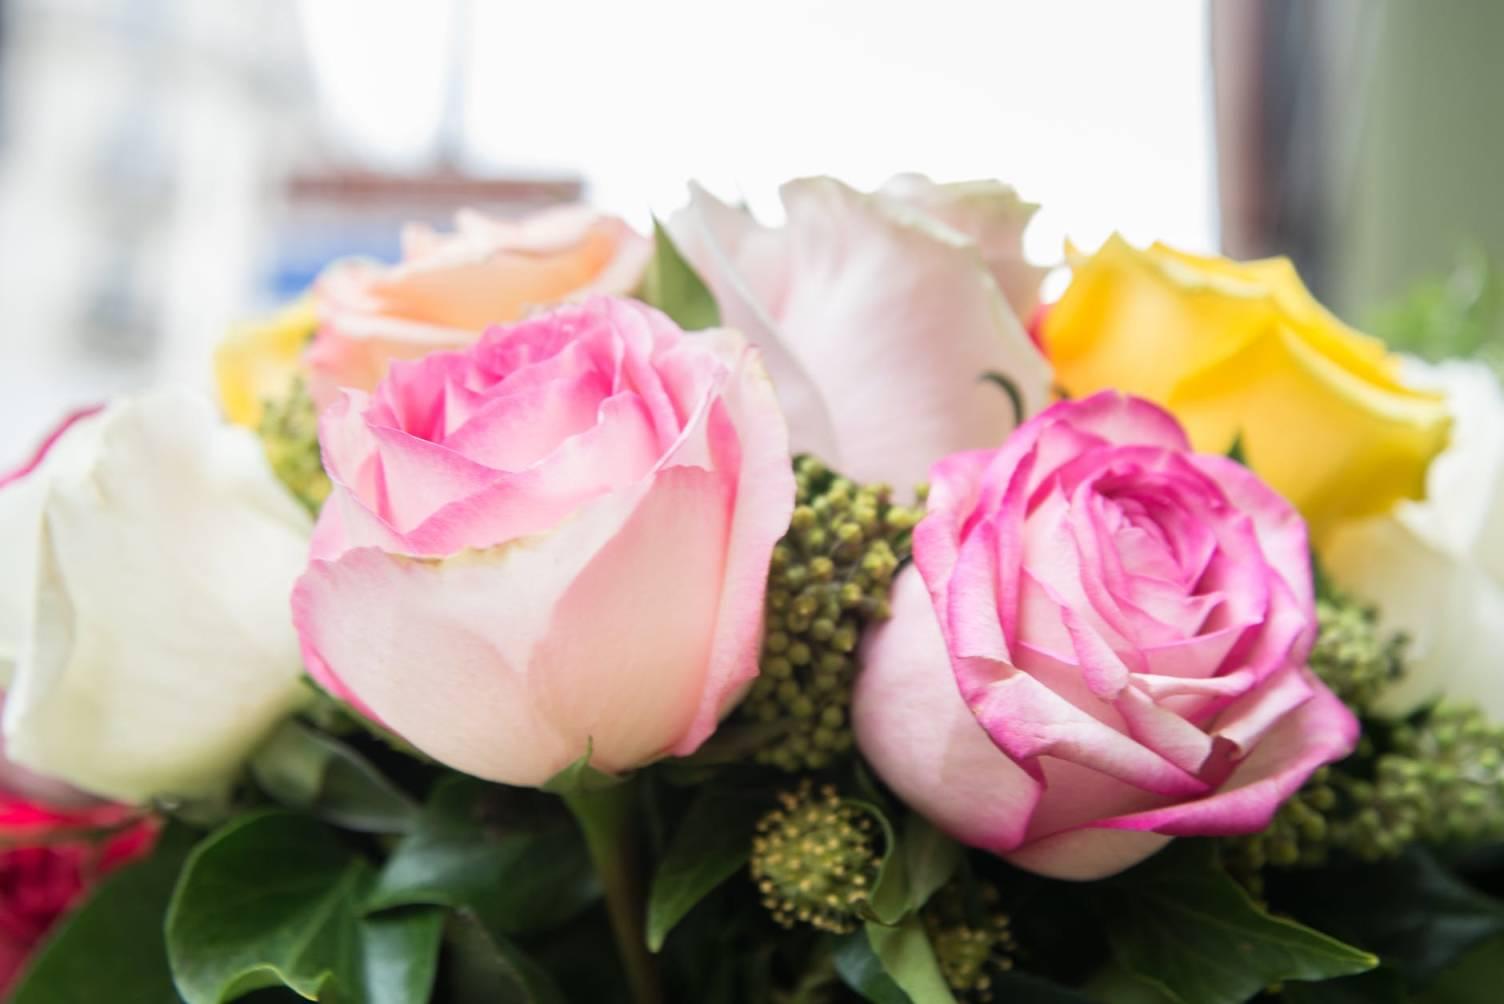 Do Flowers Make the Best Birthday Gift?